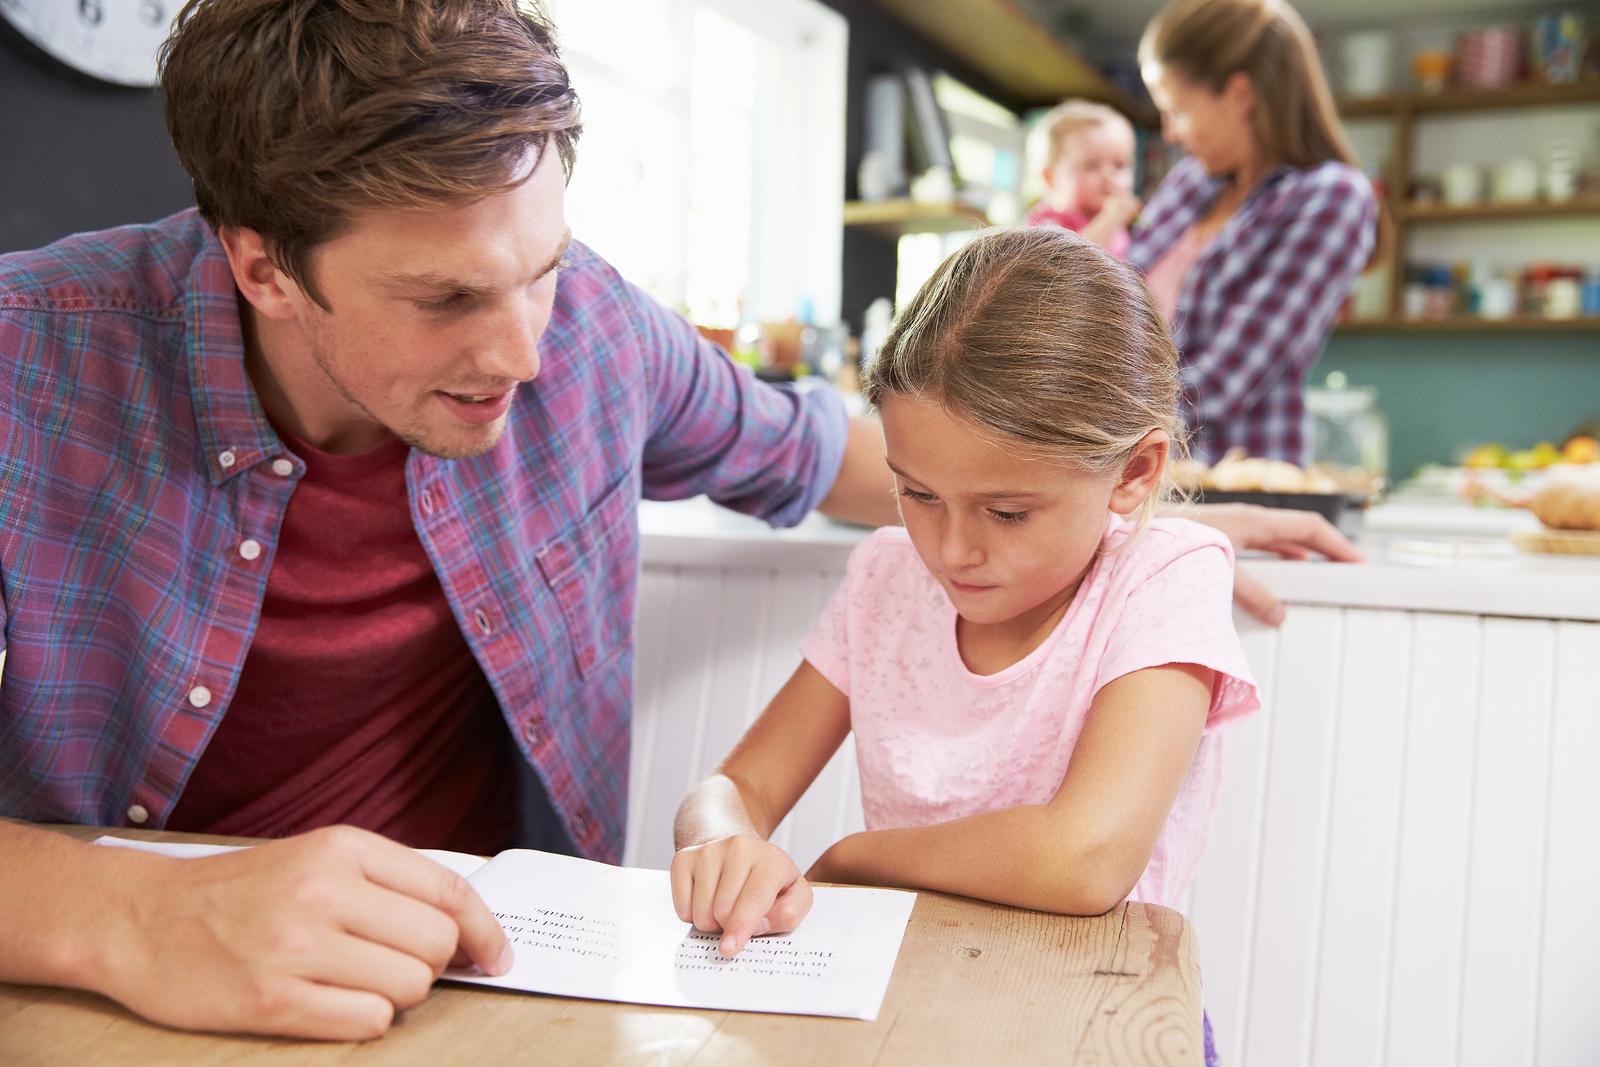 Website that pay professors do homework